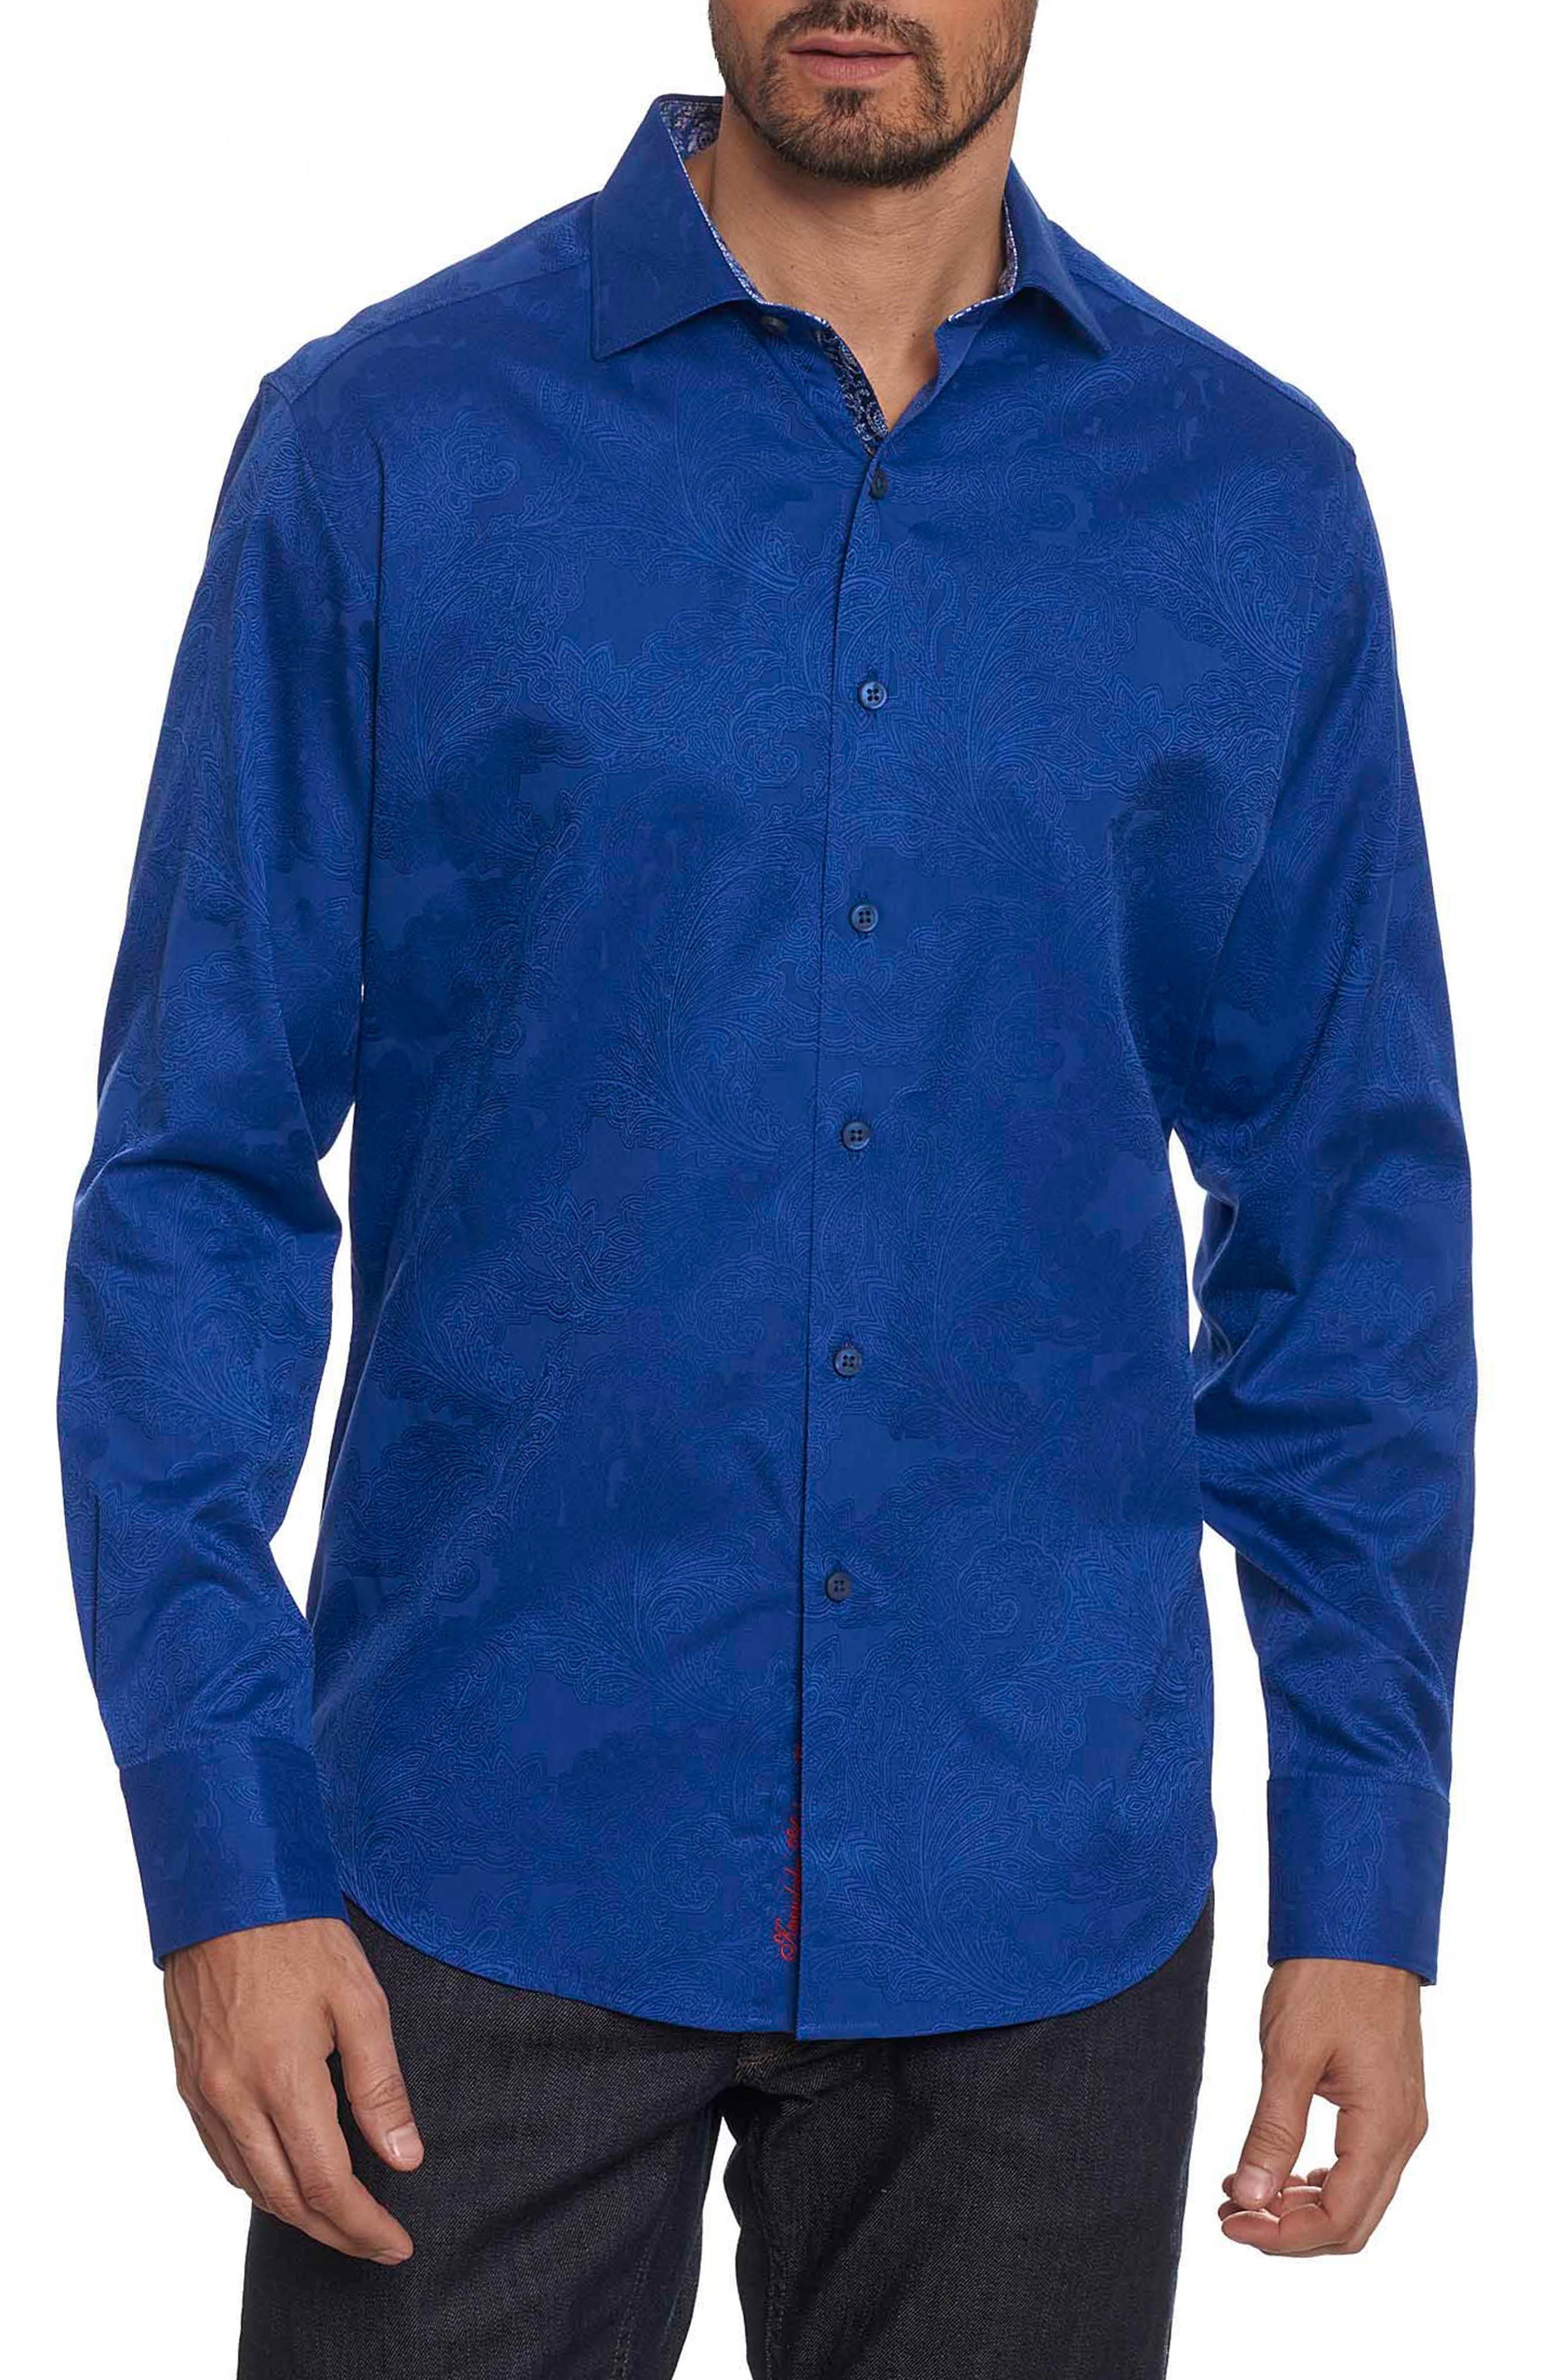 Robert Graham Rosendale Classic Fit Jacquard Sport Shirt (Tall)